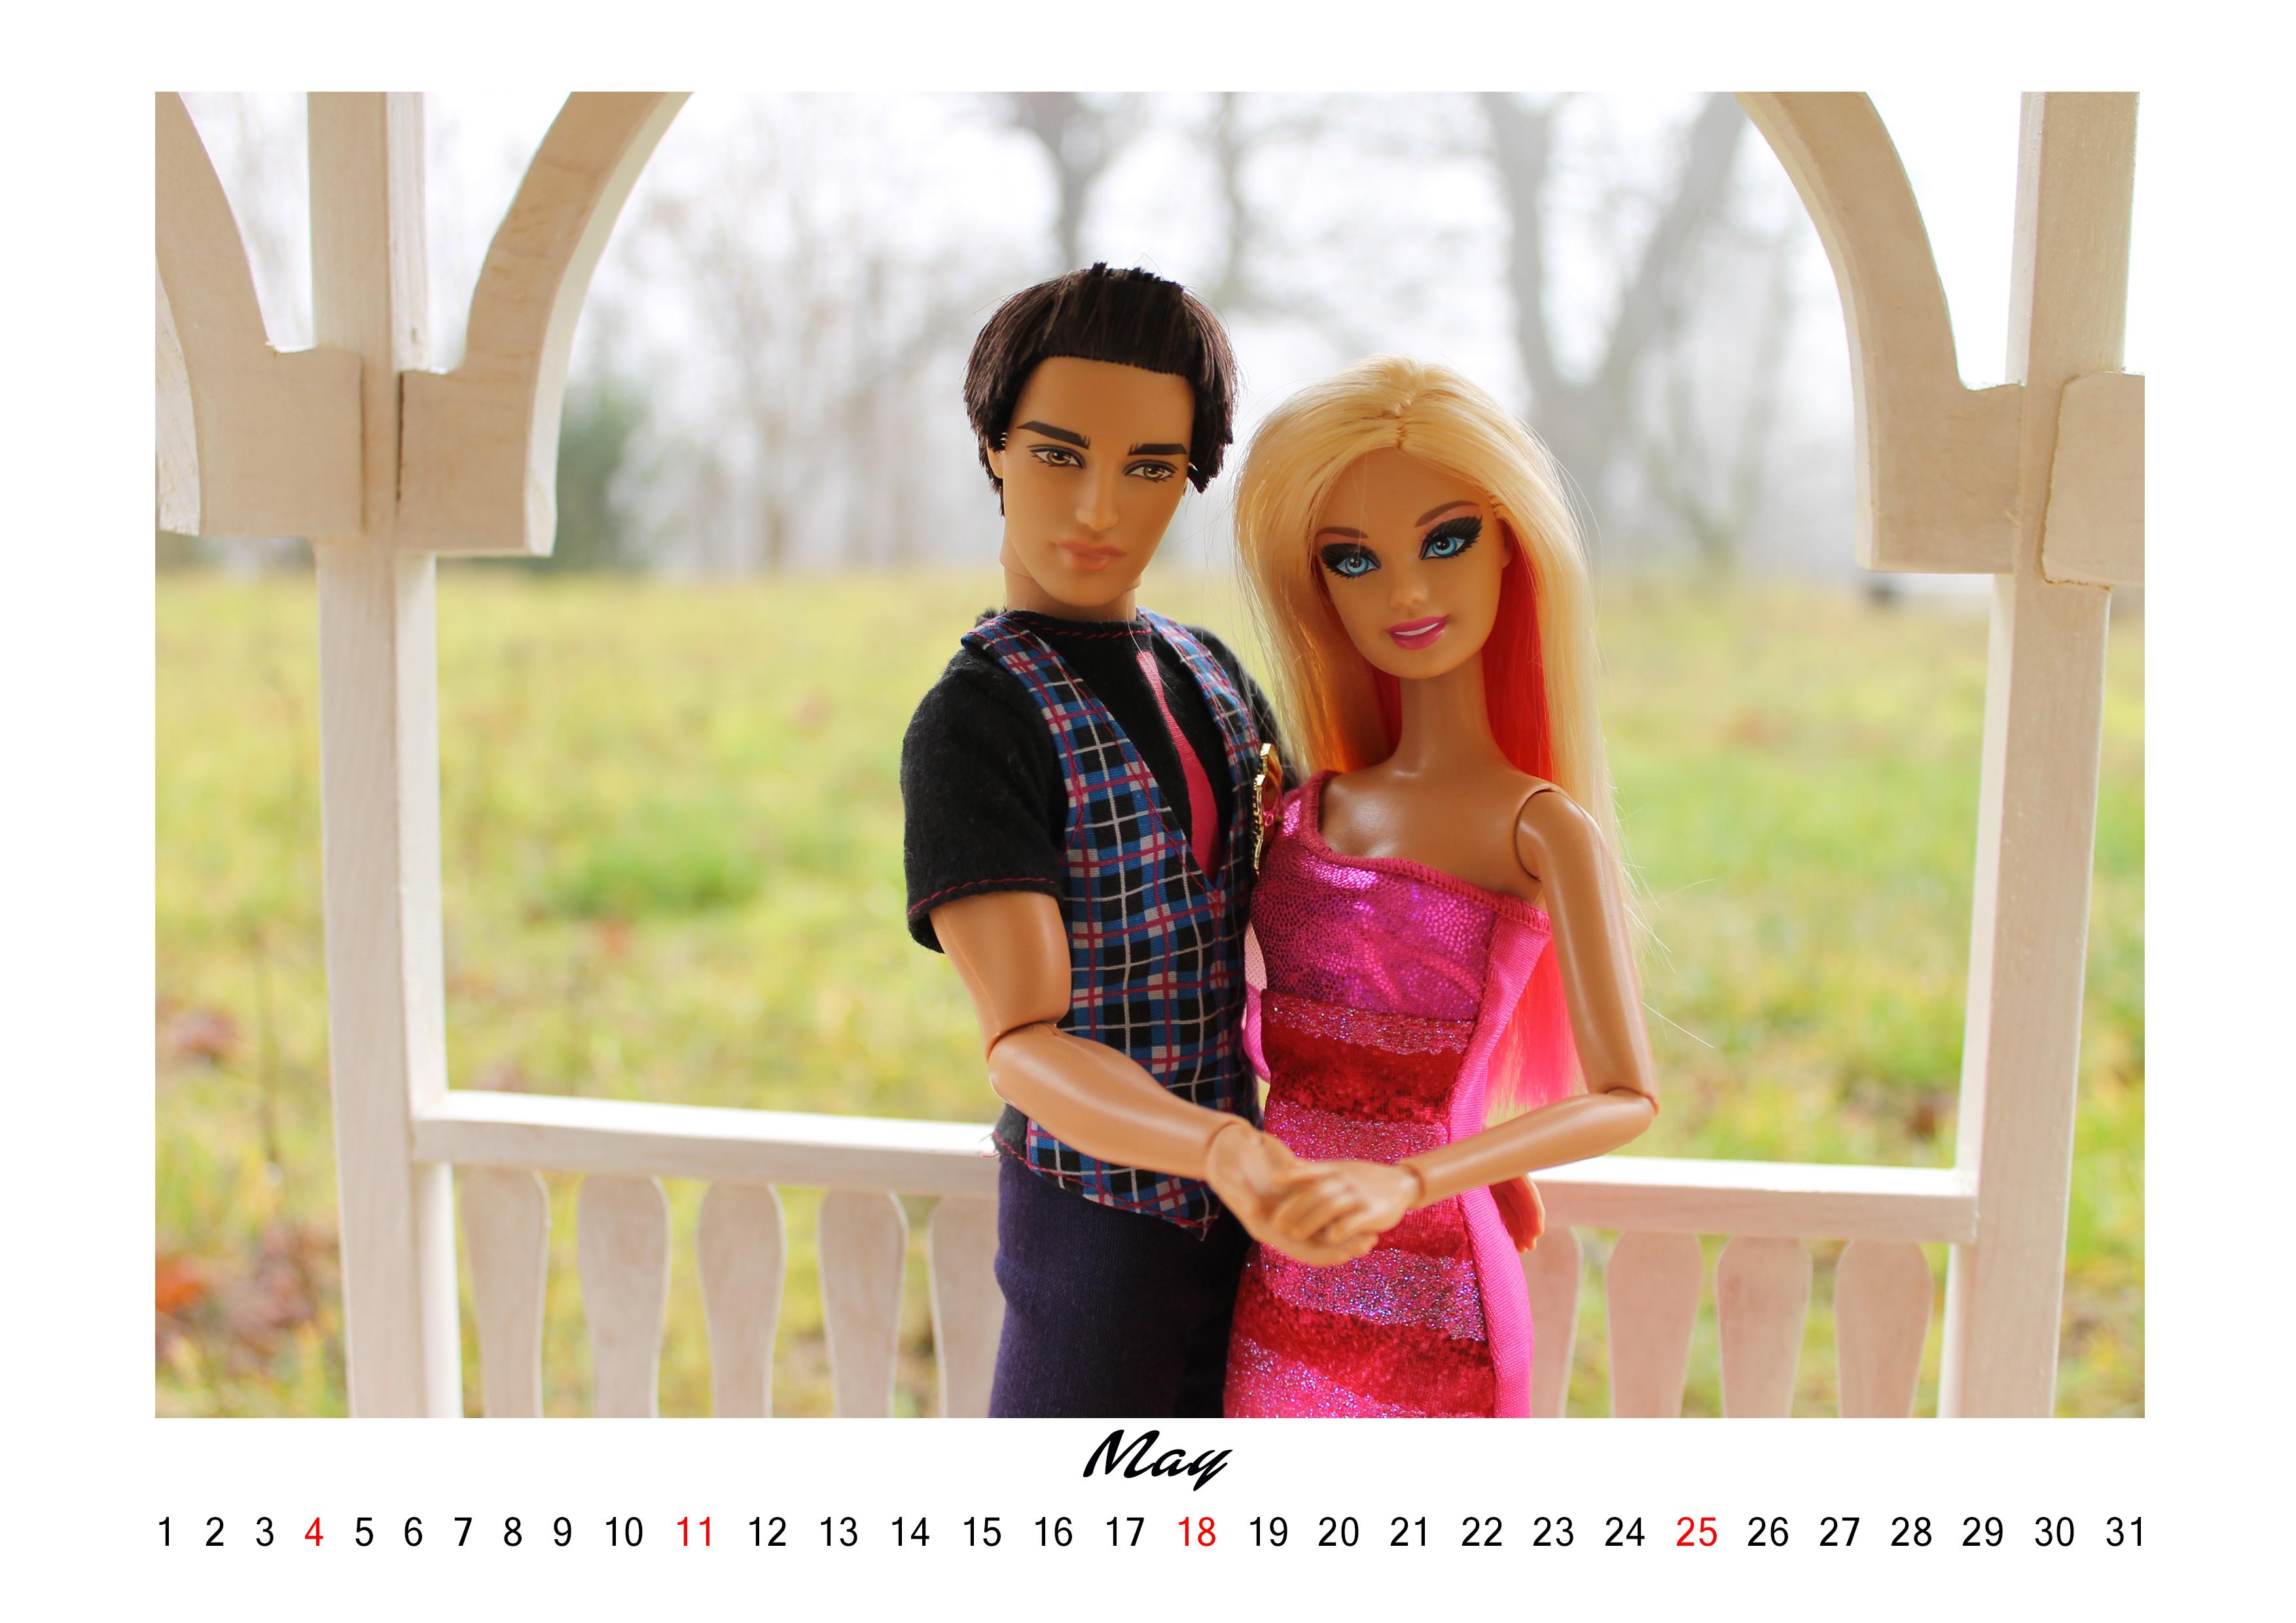 Abby Hooters Calendar May : Calendar for may barbie edition by abby